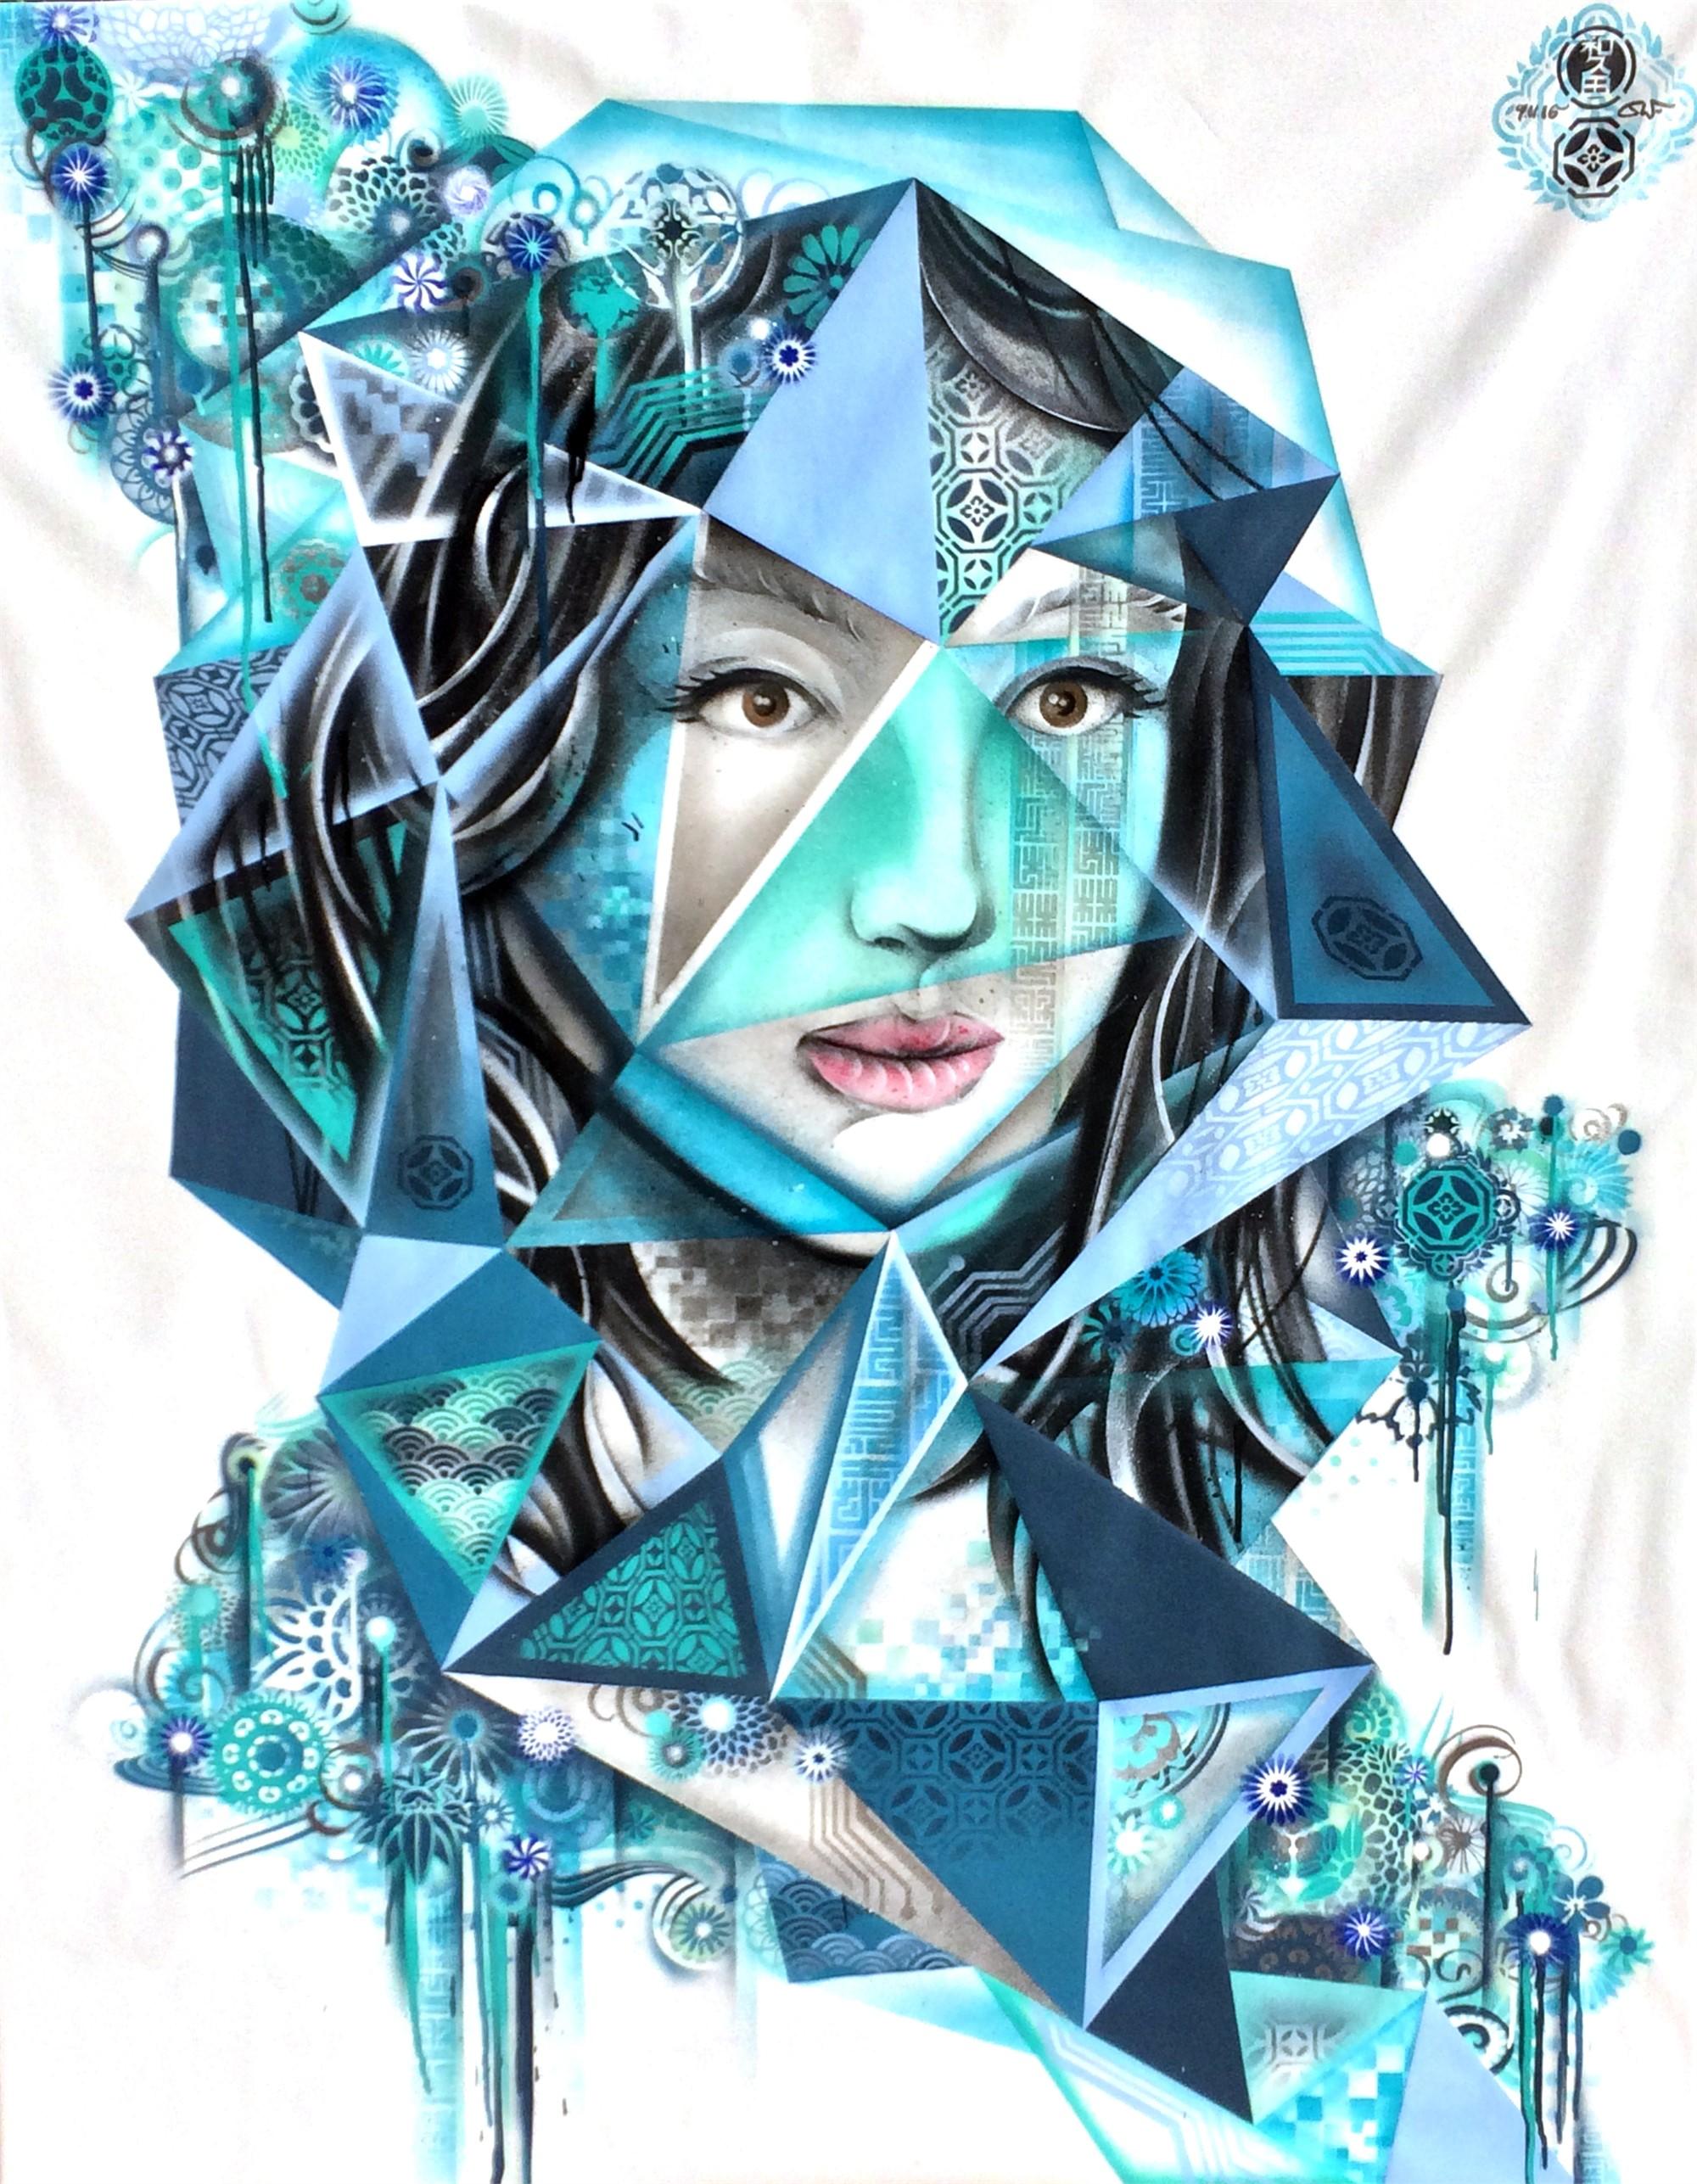 Behind the Digital Veil by Jonathan Wakuda Fischer